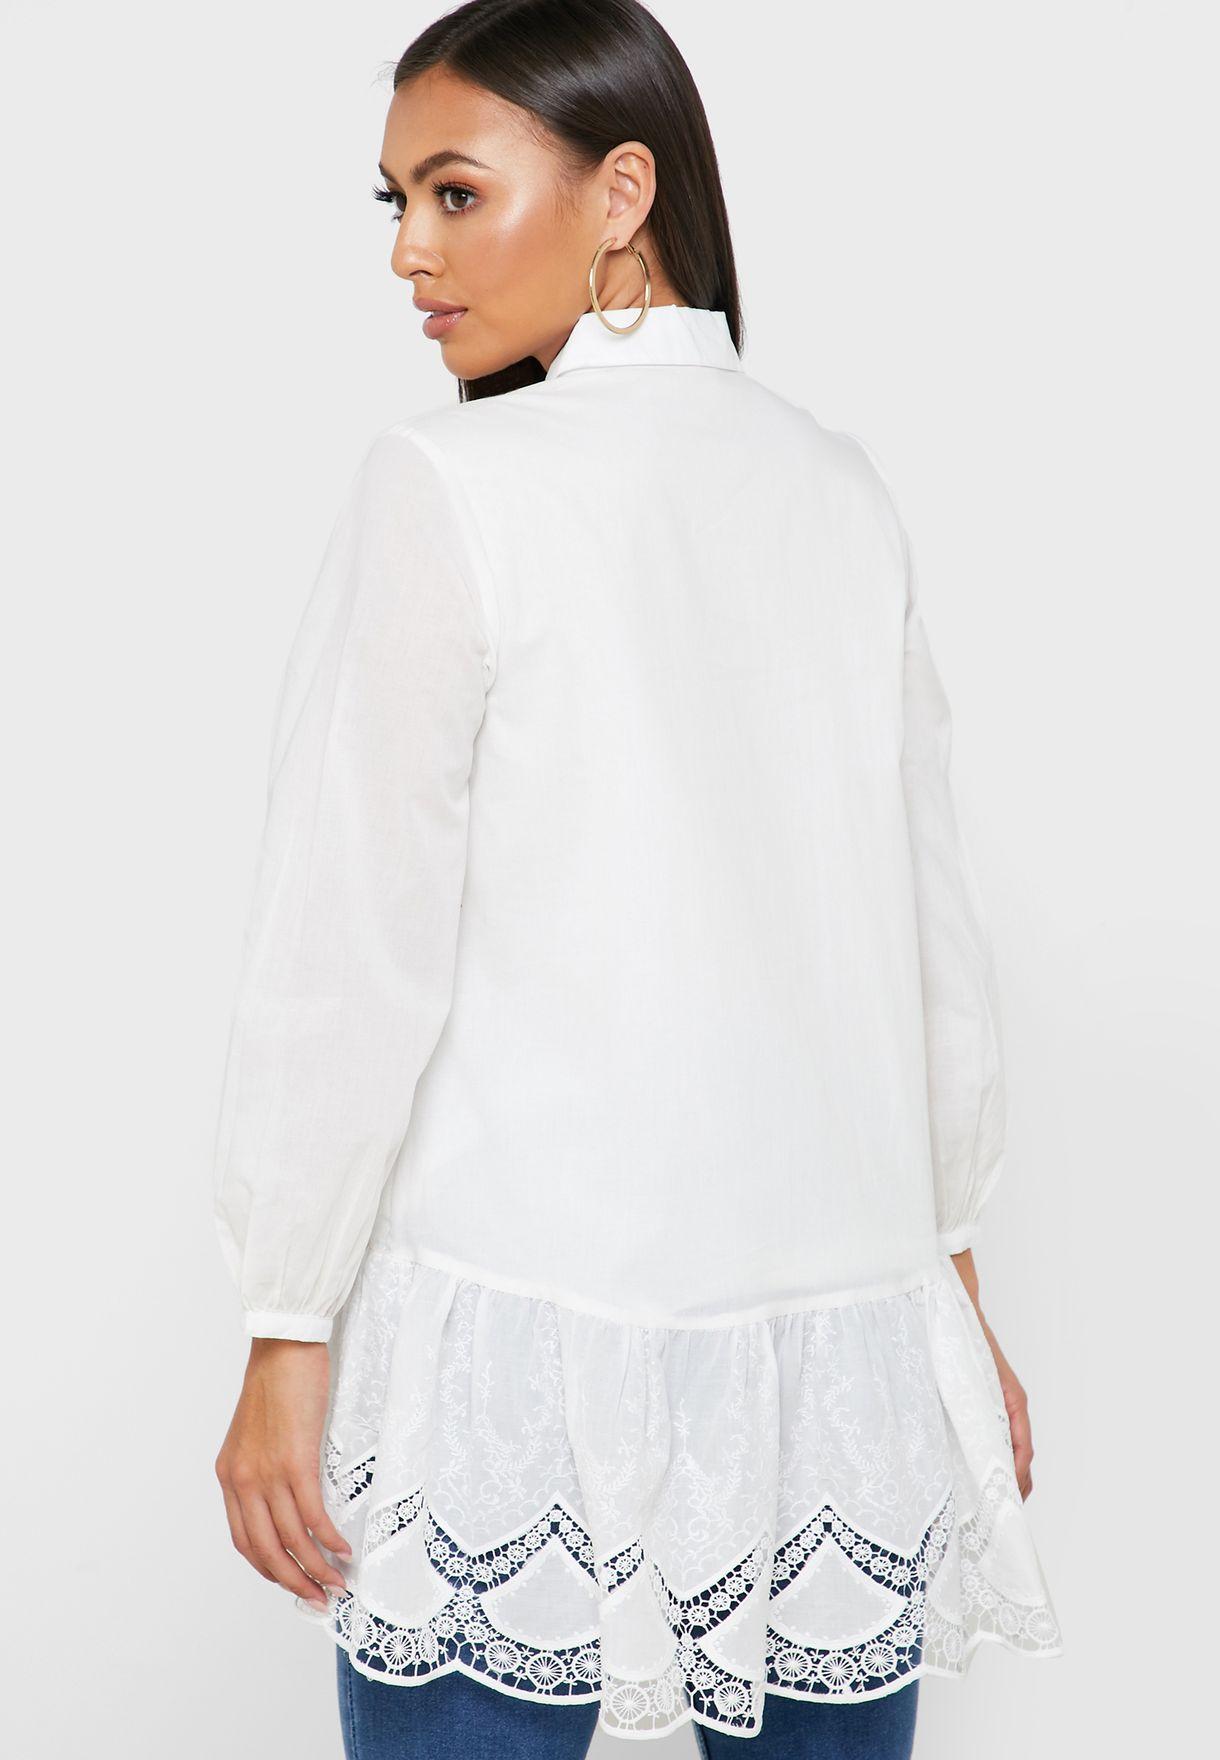 قميص مزين بكشكش